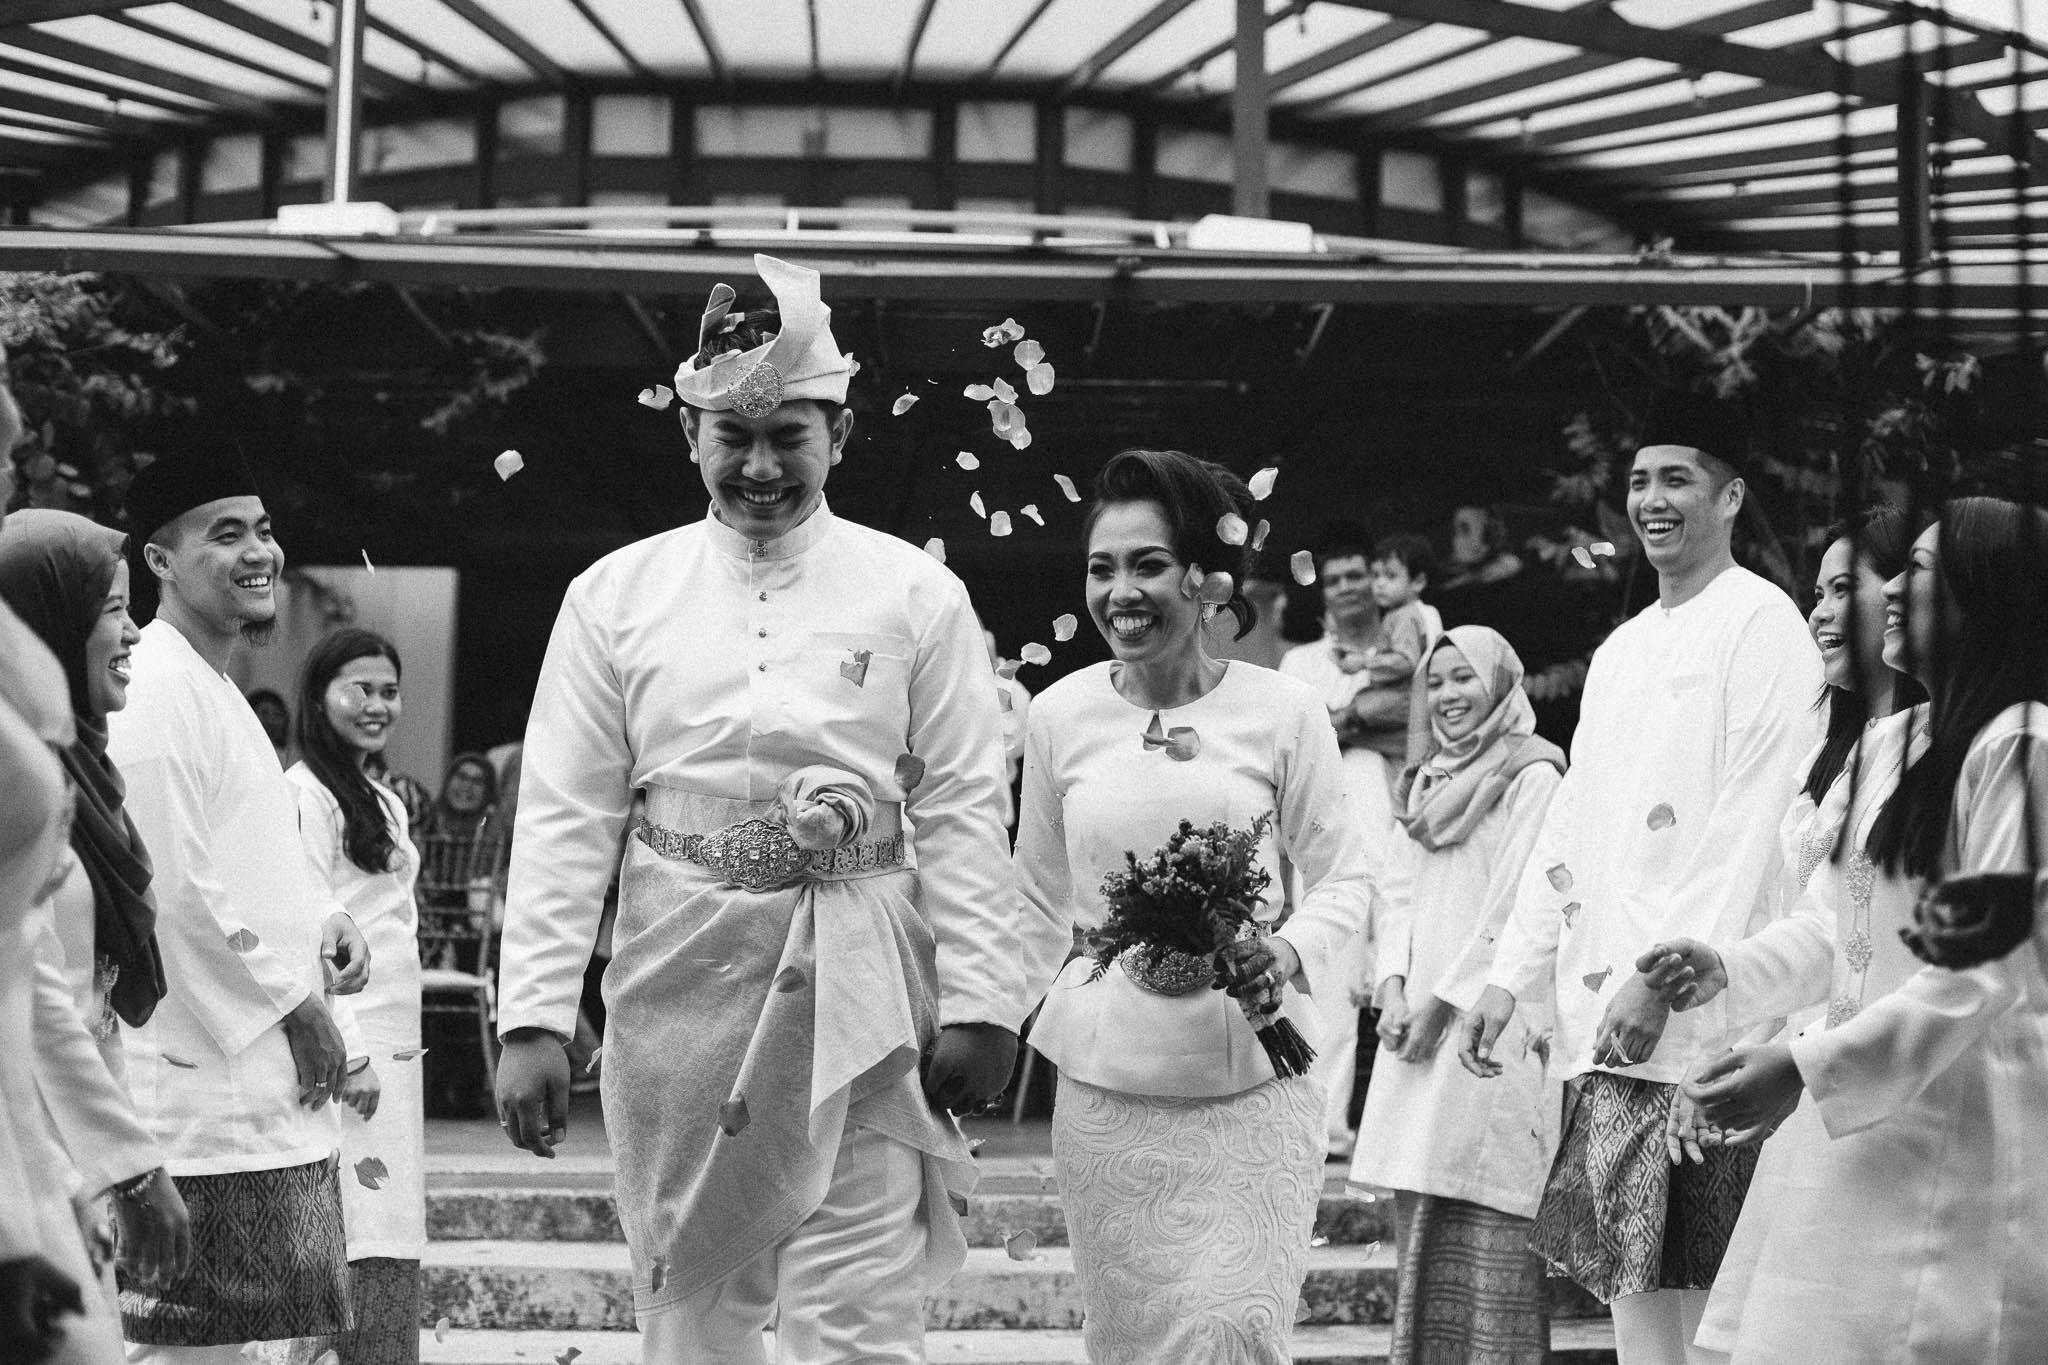 singapore-wedding-photographer-malay-indian-pre-wedding-travel-wmt-2015-55.jpg